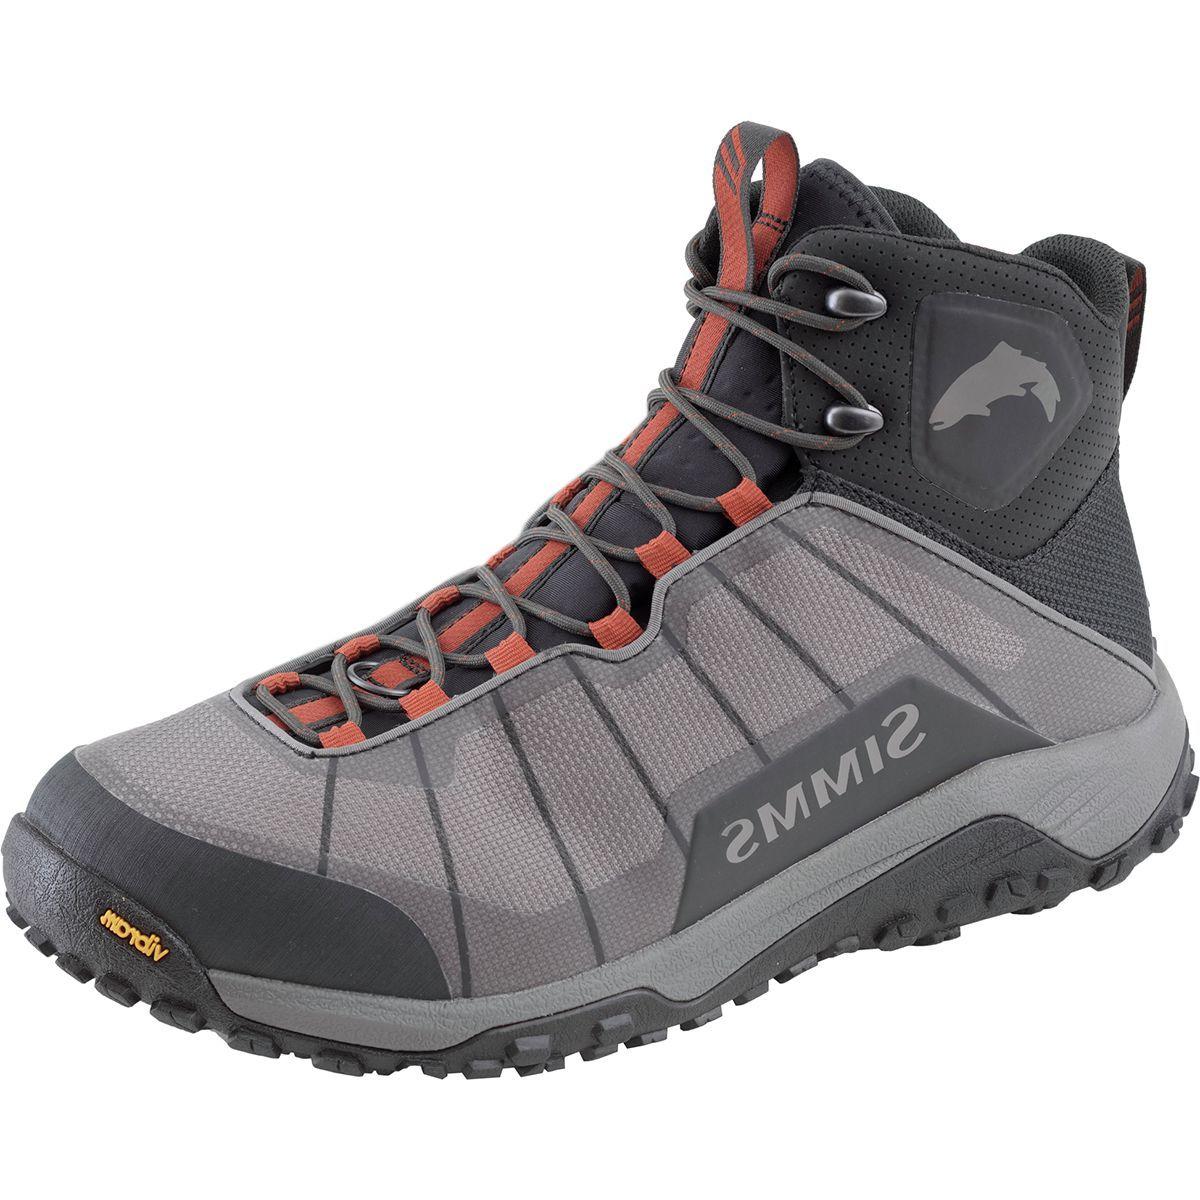 Simms Flyweight Wading Boot - Men's